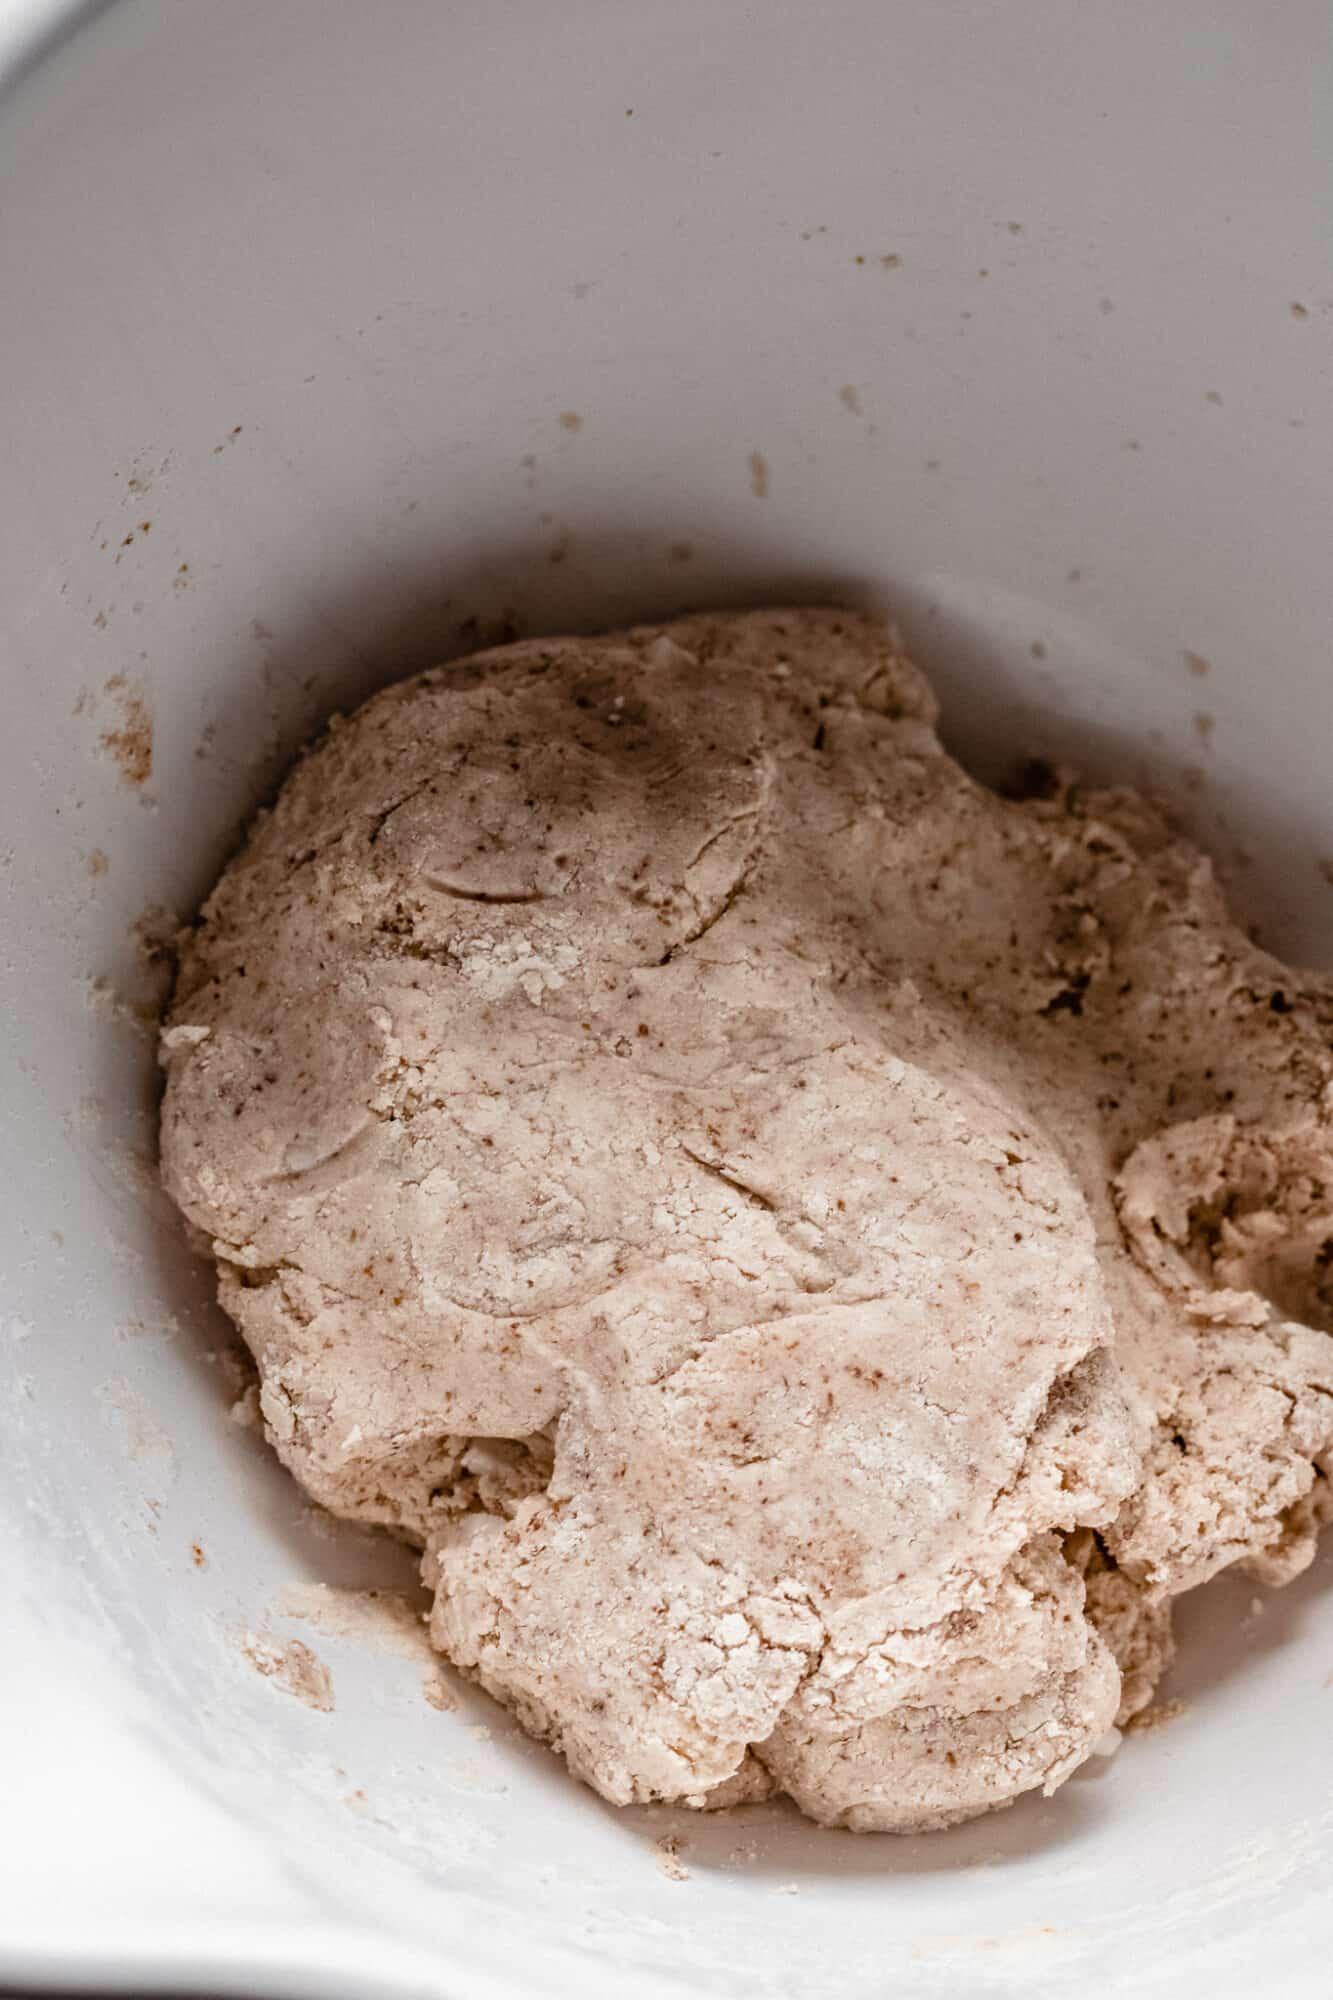 dough for vegan biscuit